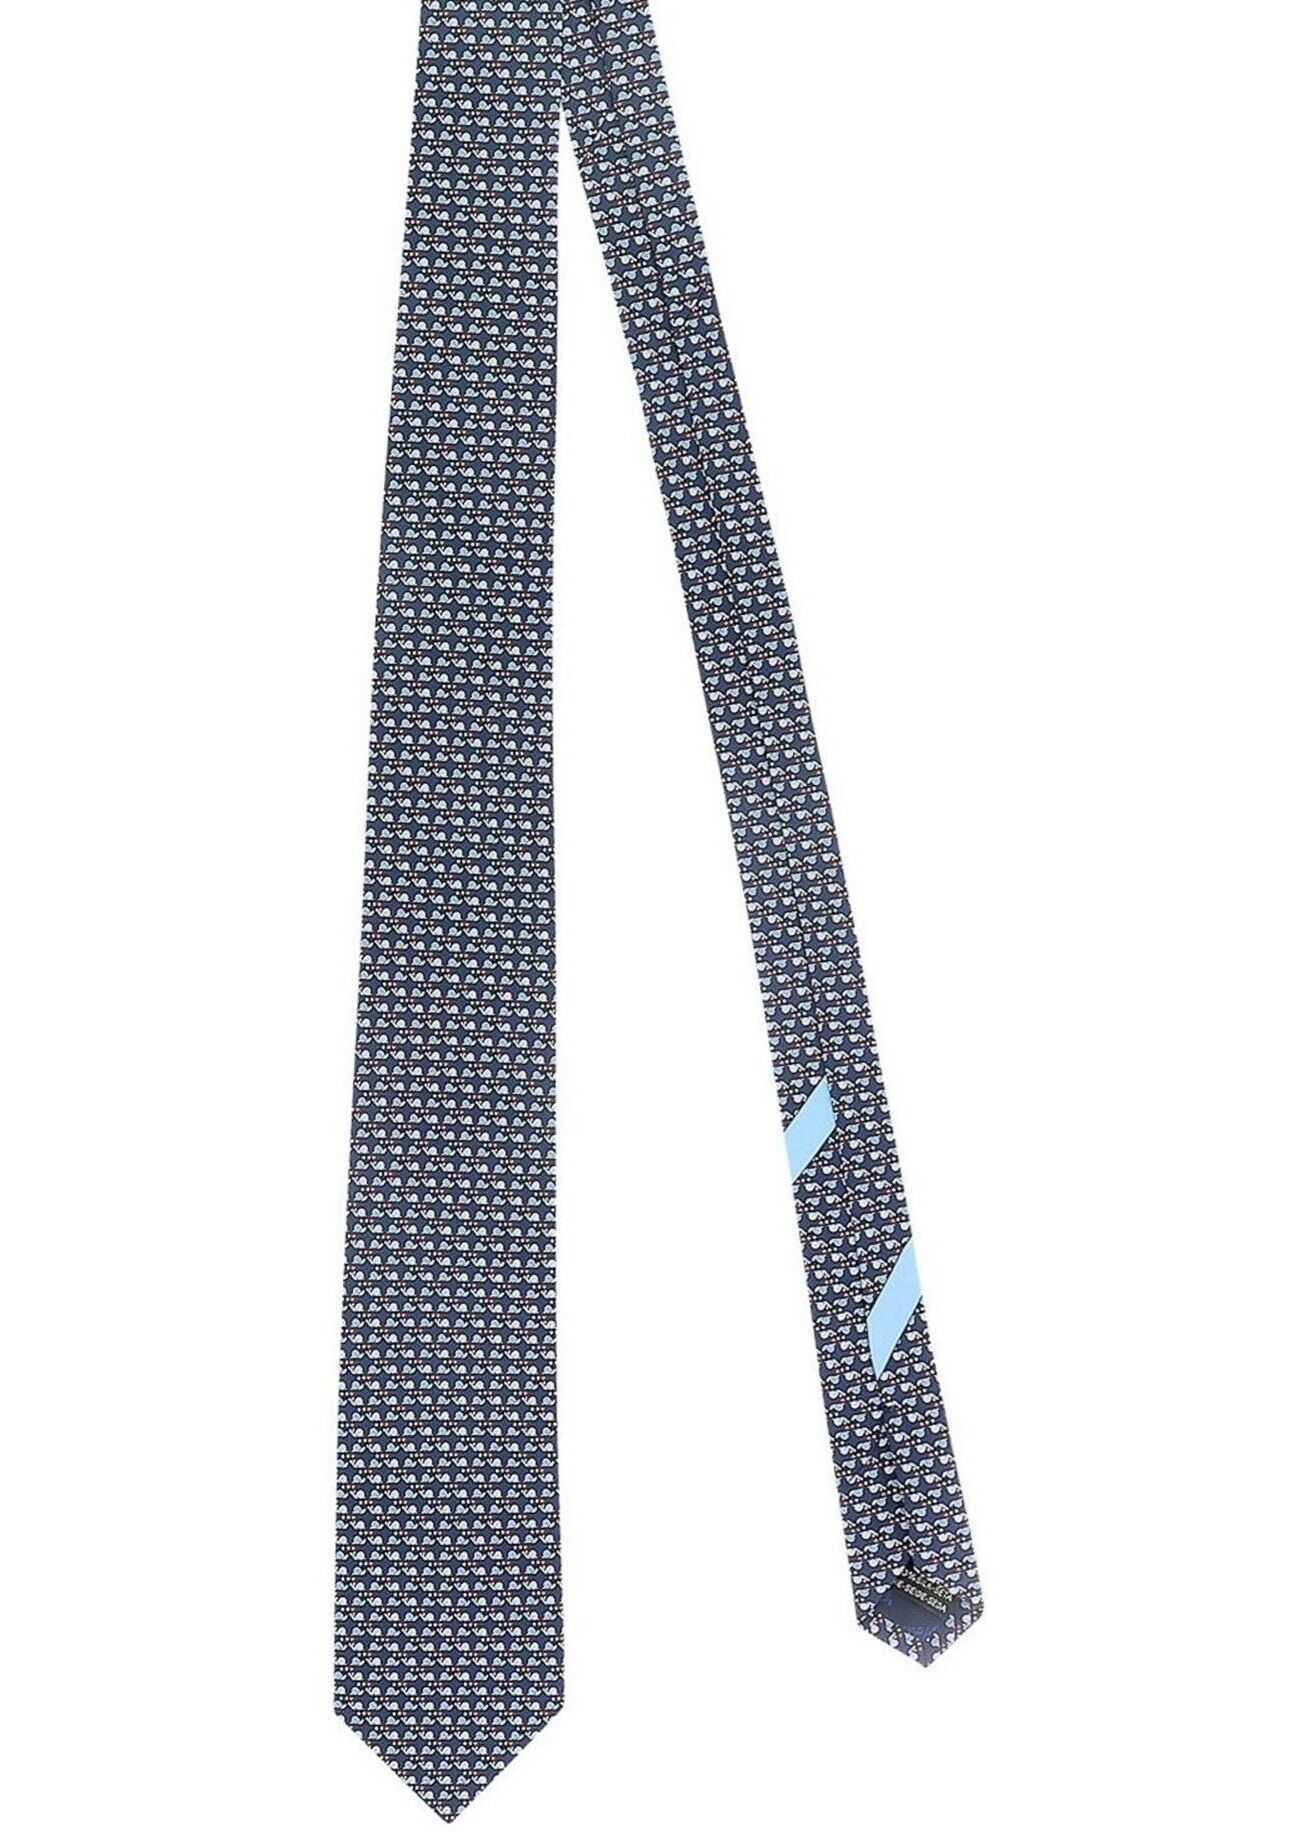 Salvatore Ferragamo Snail Printed Tie In Blue Blue